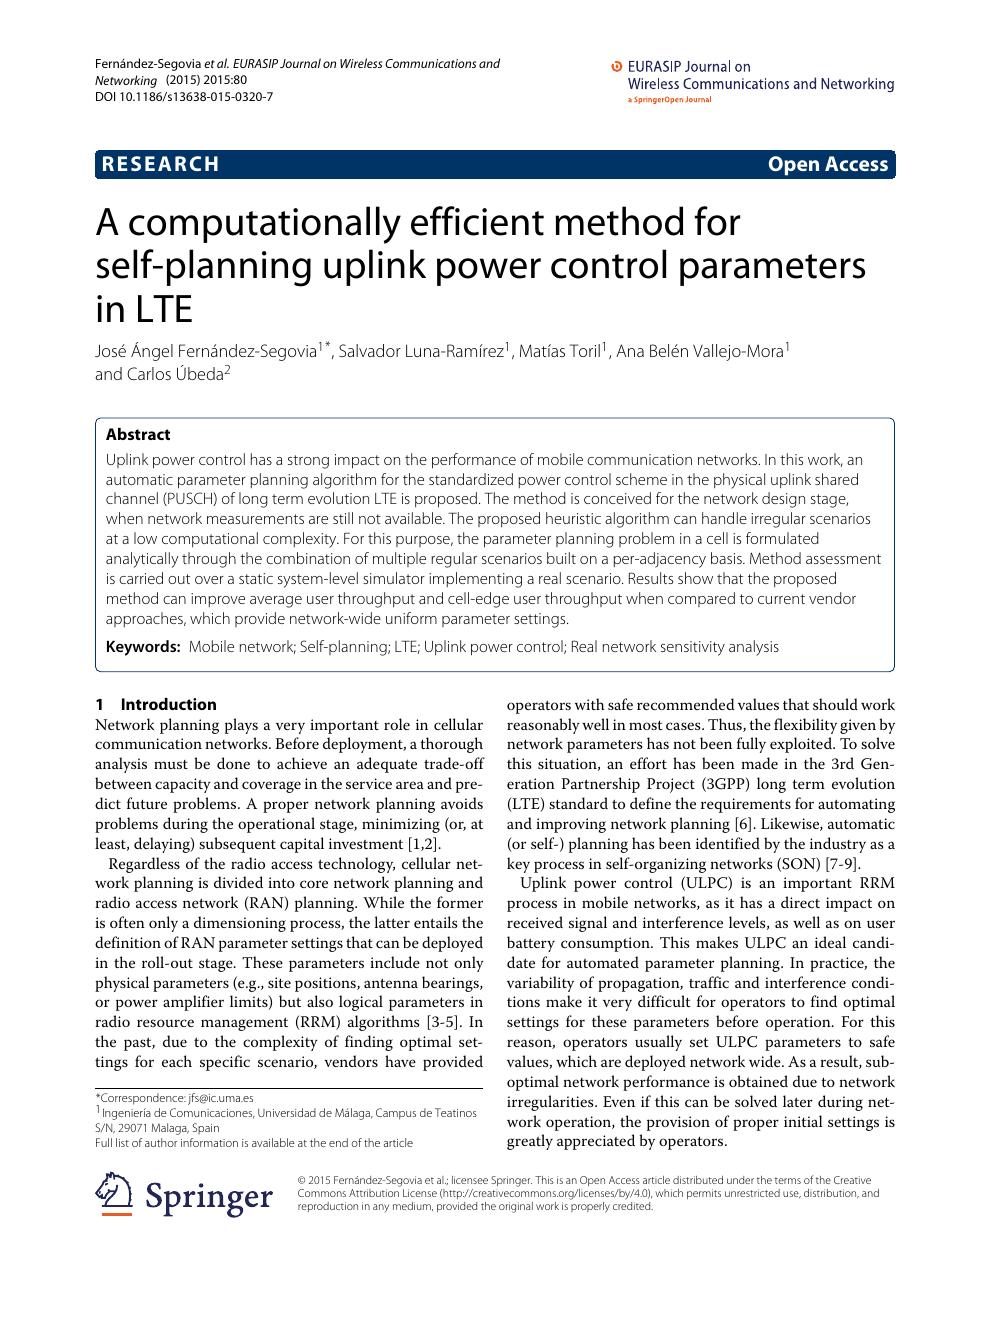 A computationally efficient method for self-planning uplink